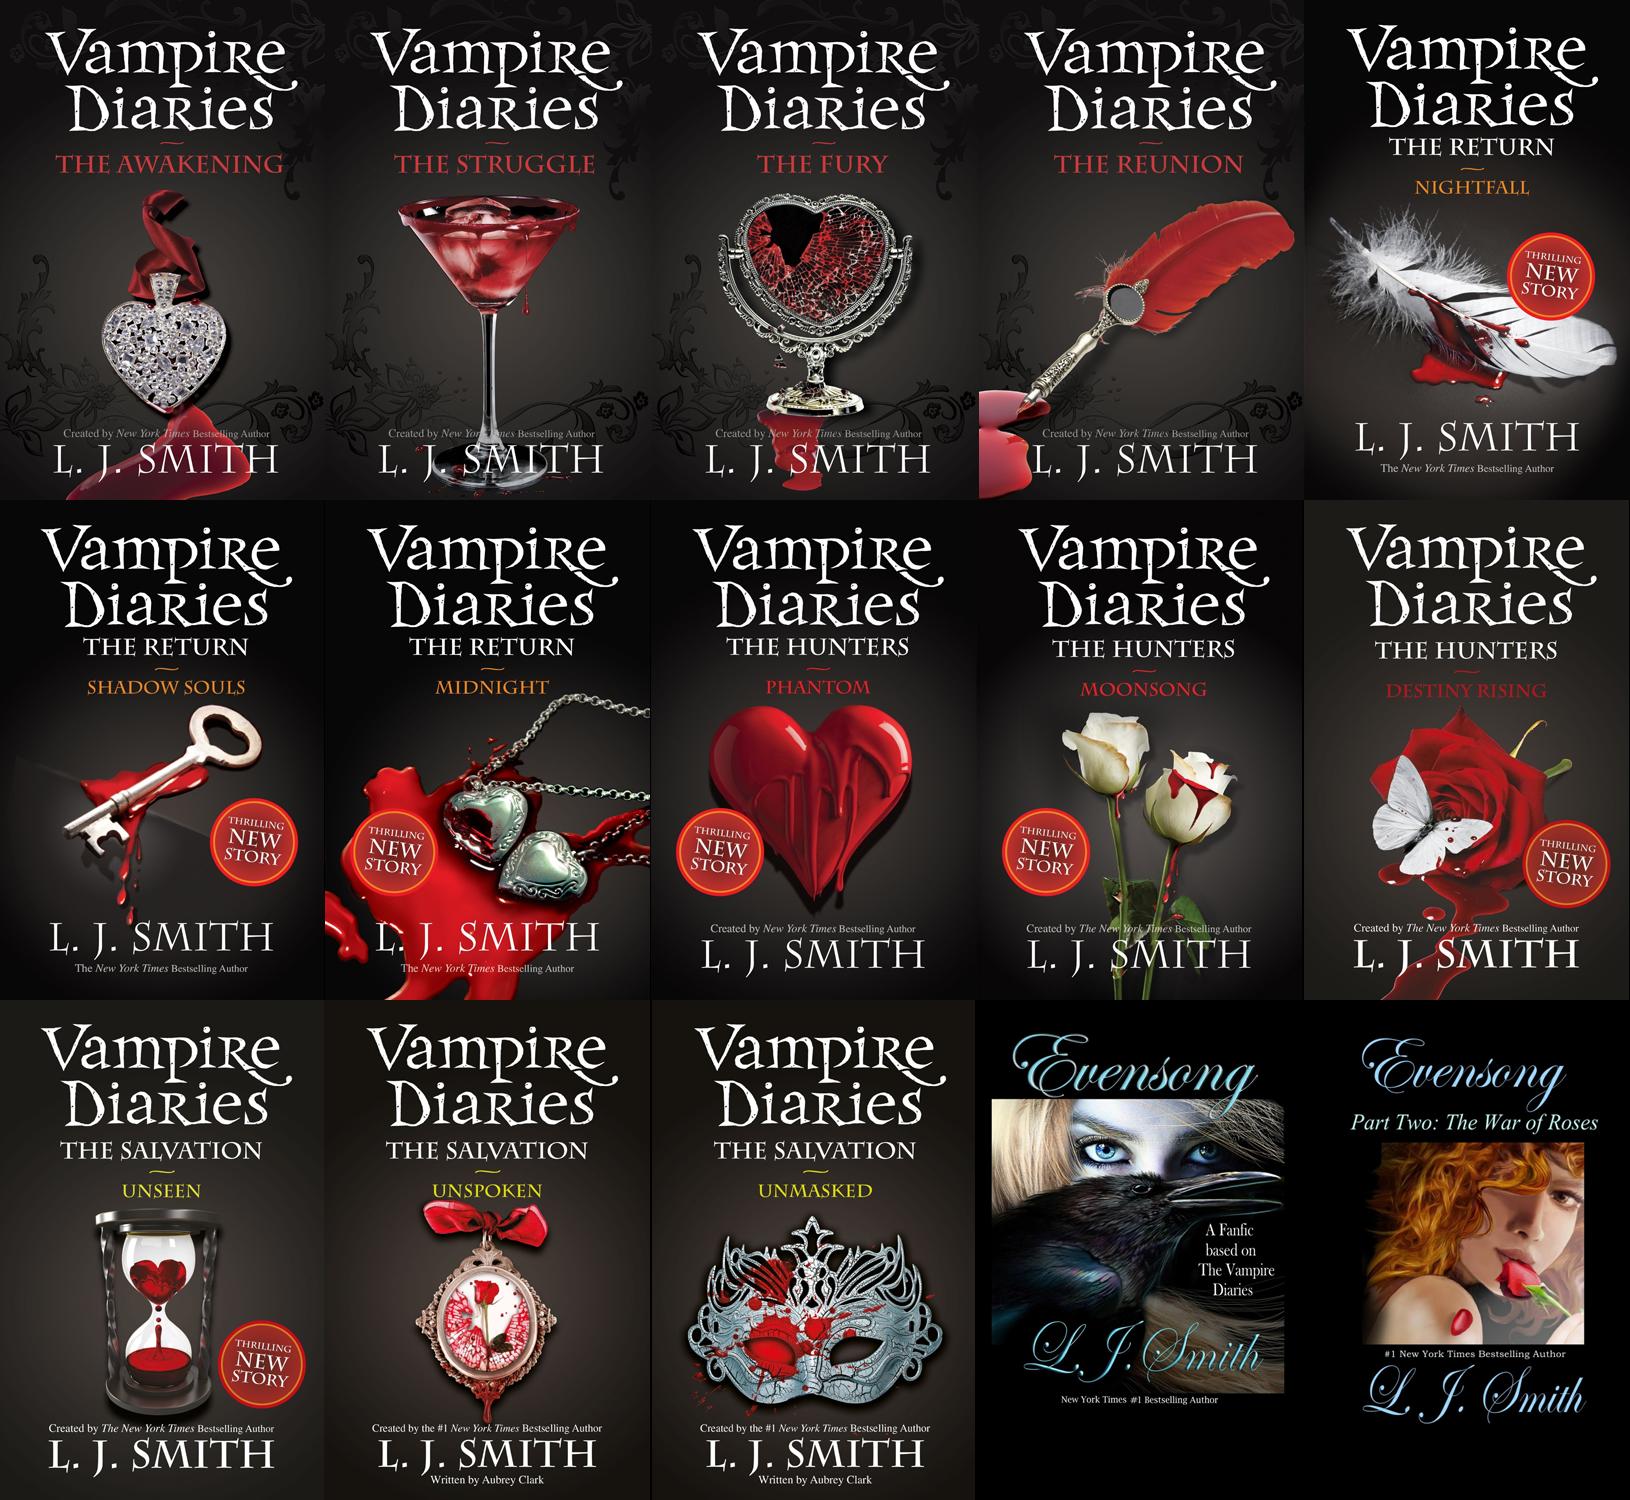 The Vampire Diaries Wikibackground